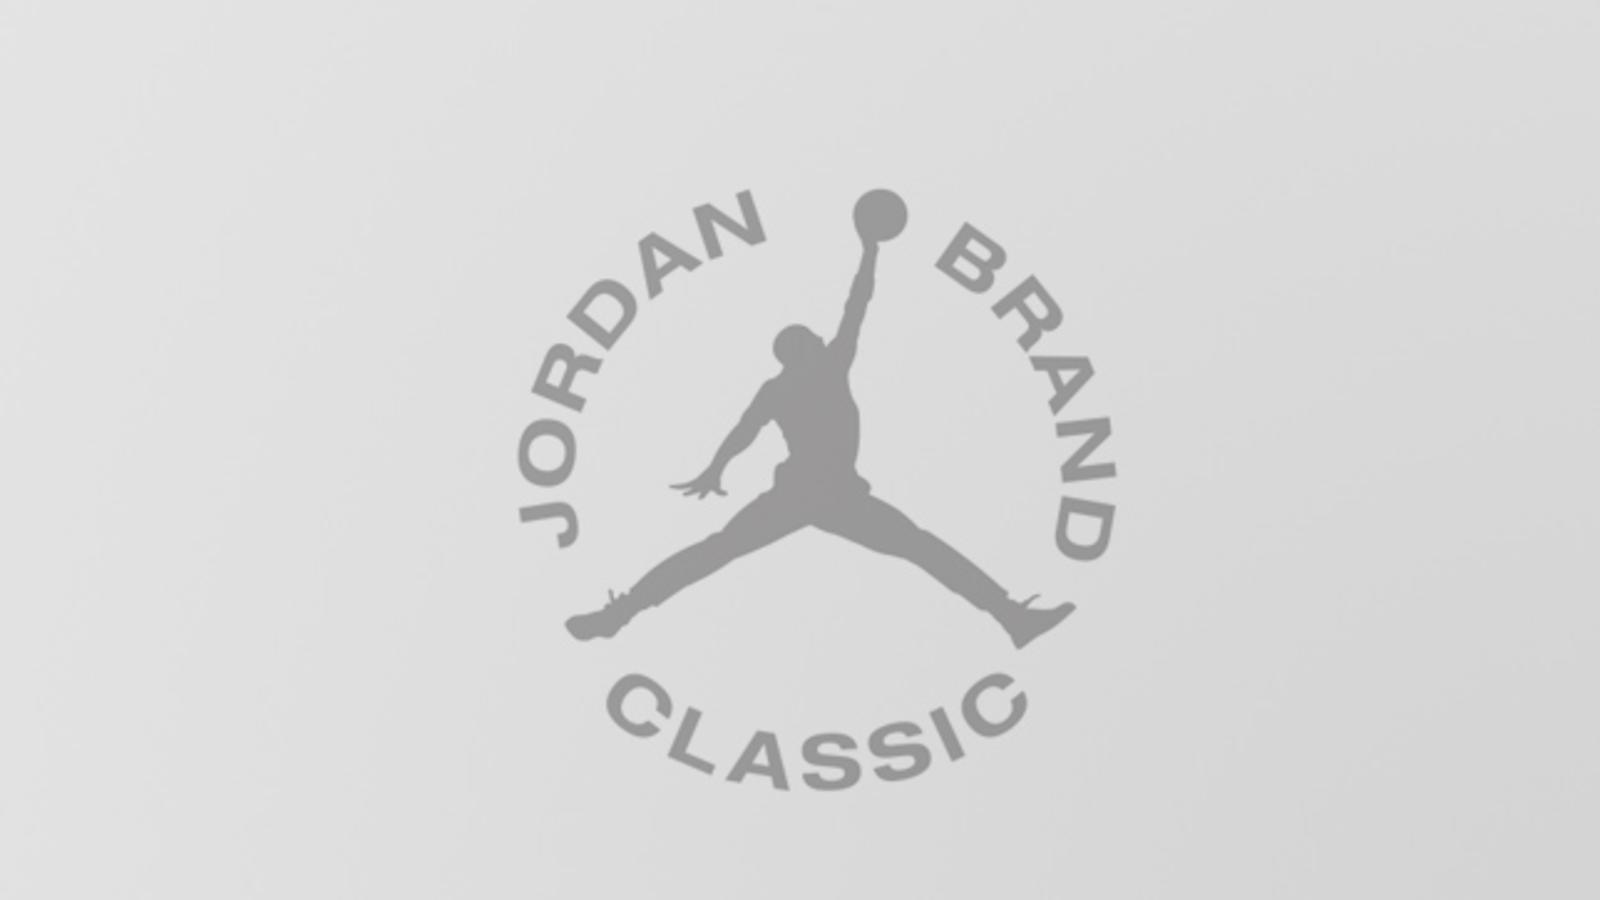 Nike News - Jordan Brand Classic International Roster Finalized